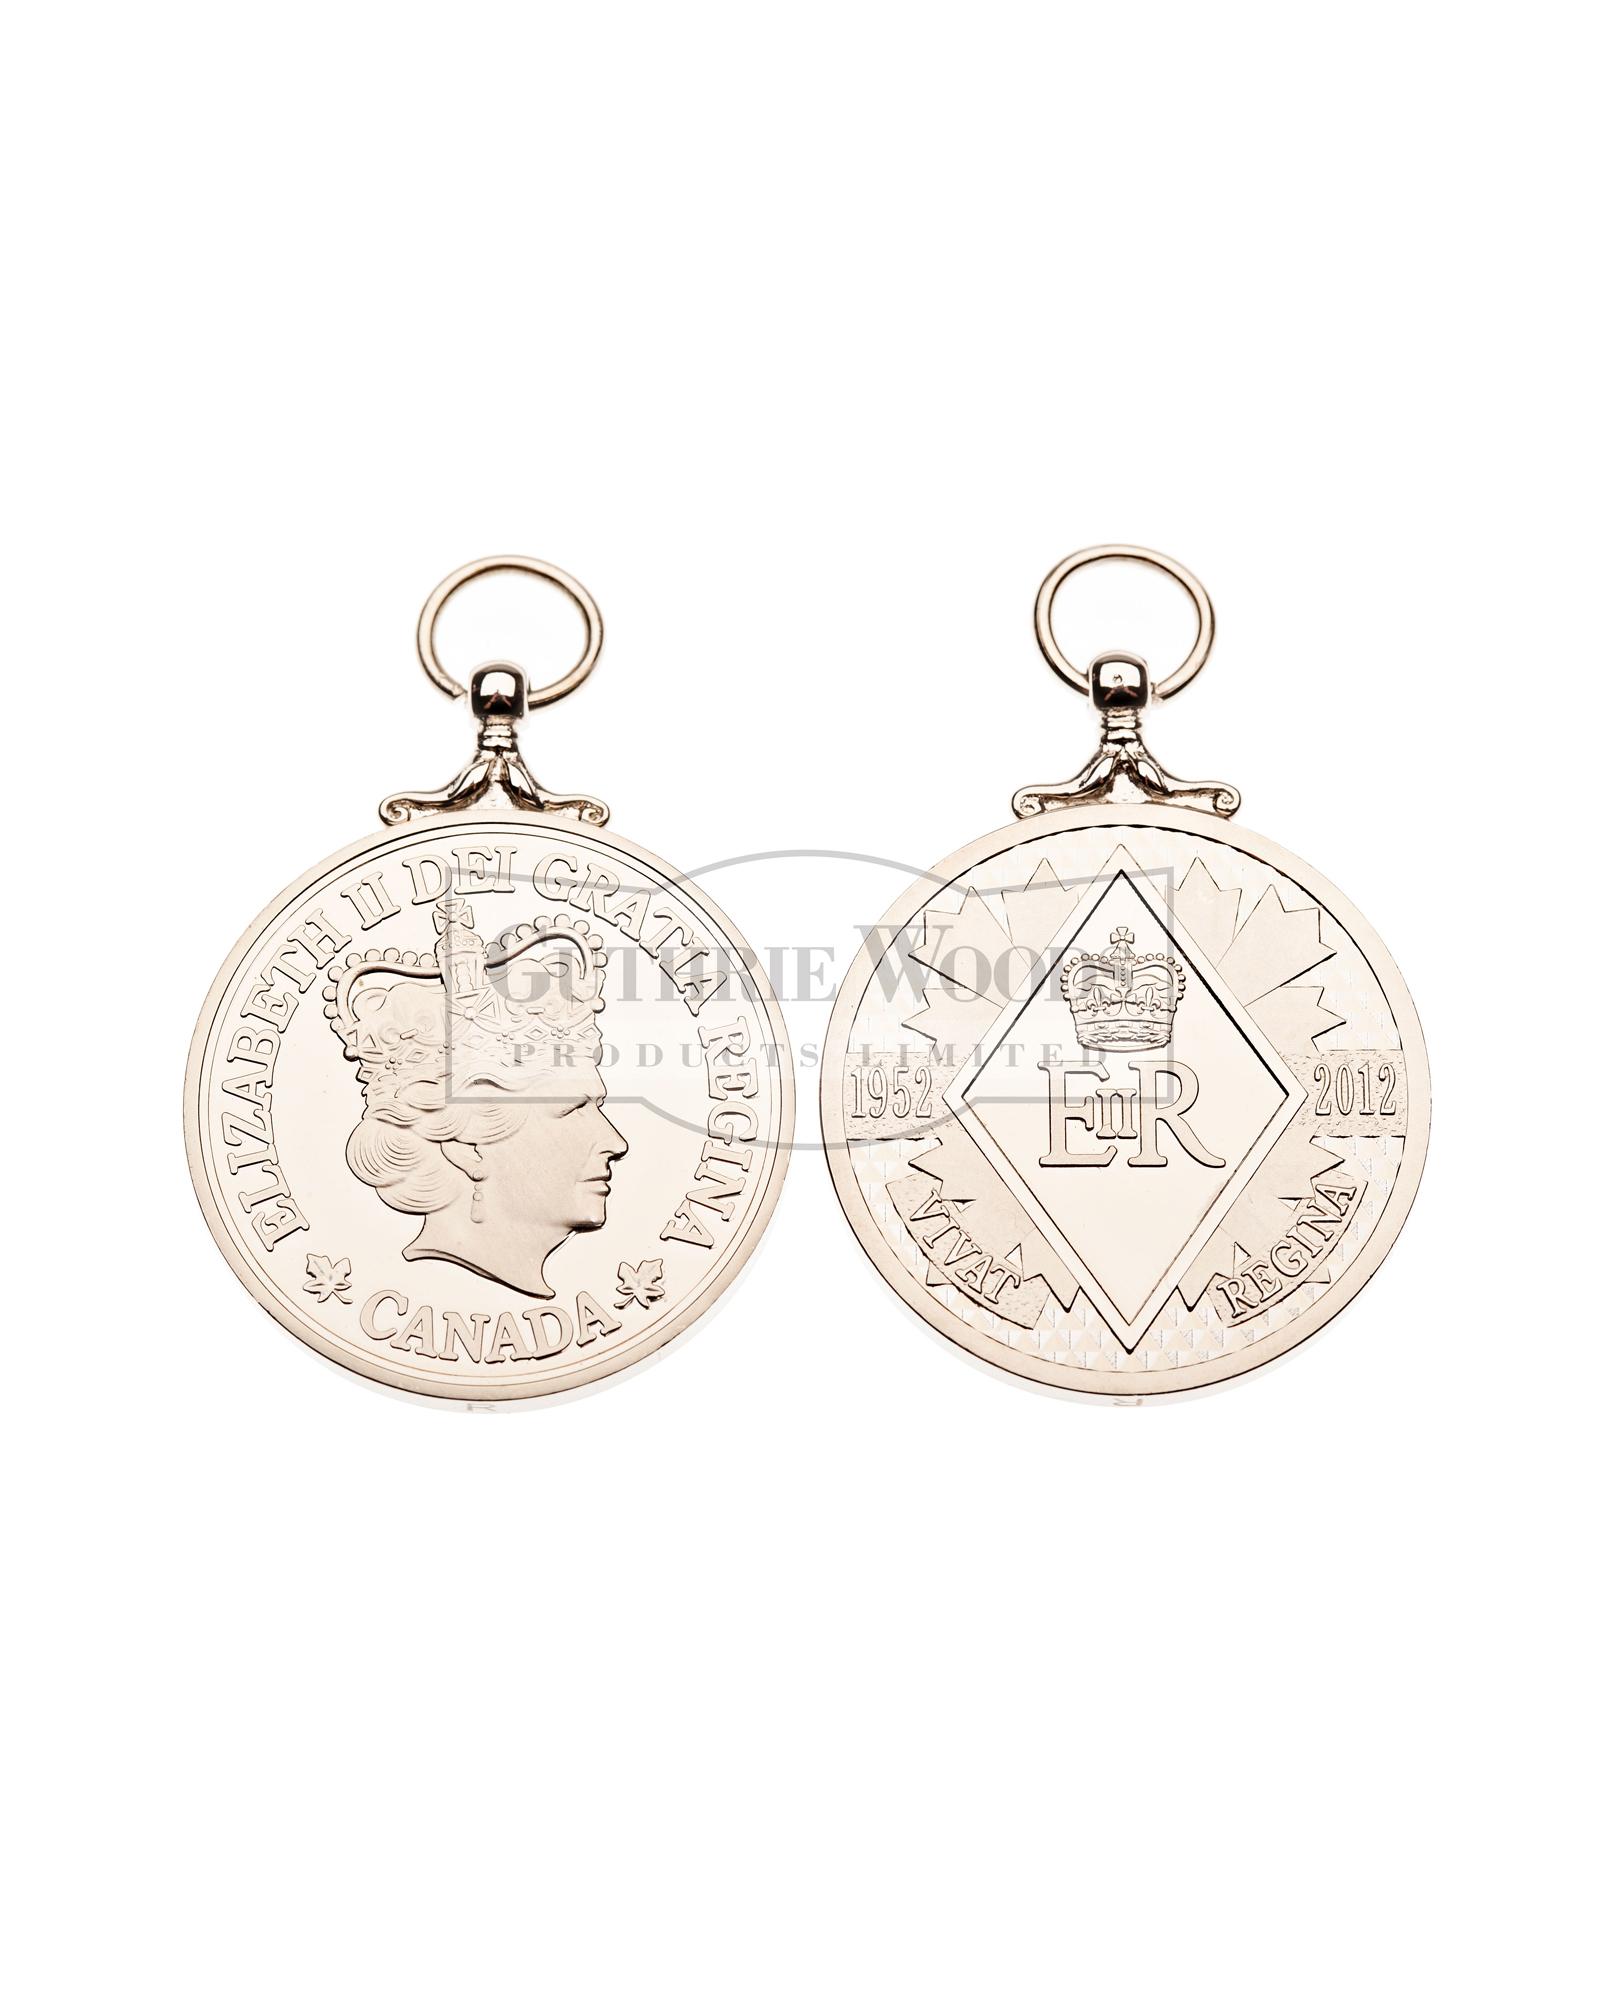 Queen's Diamond Jubilee (QDJM) - Medal